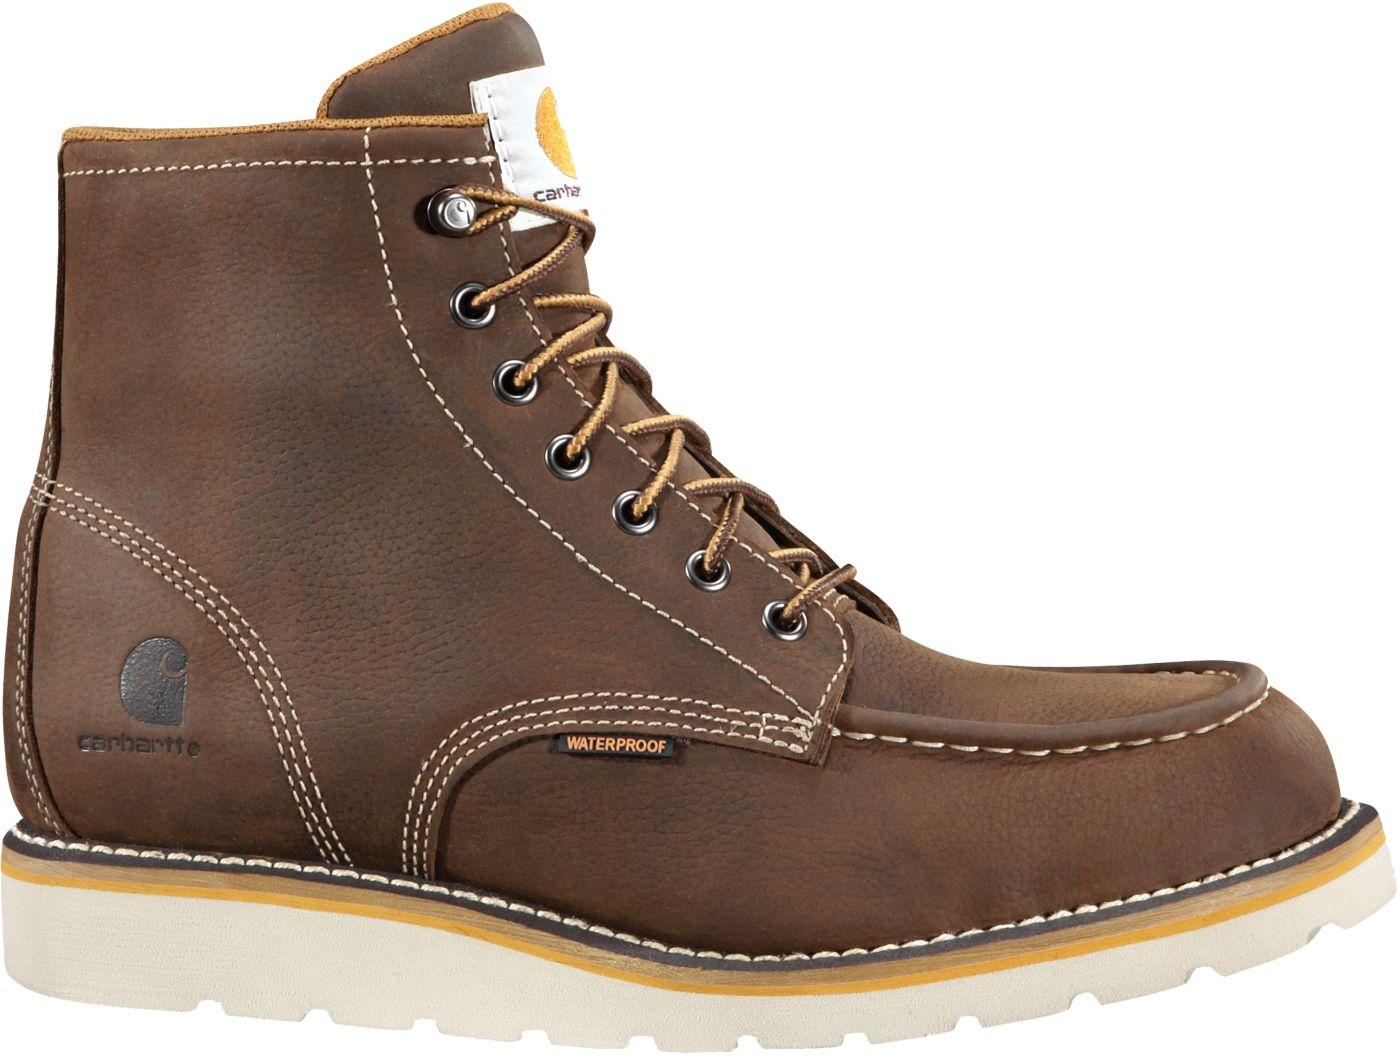 Carhartt Men's Moc Toe Wedge 6'' Waterproof Work Boots